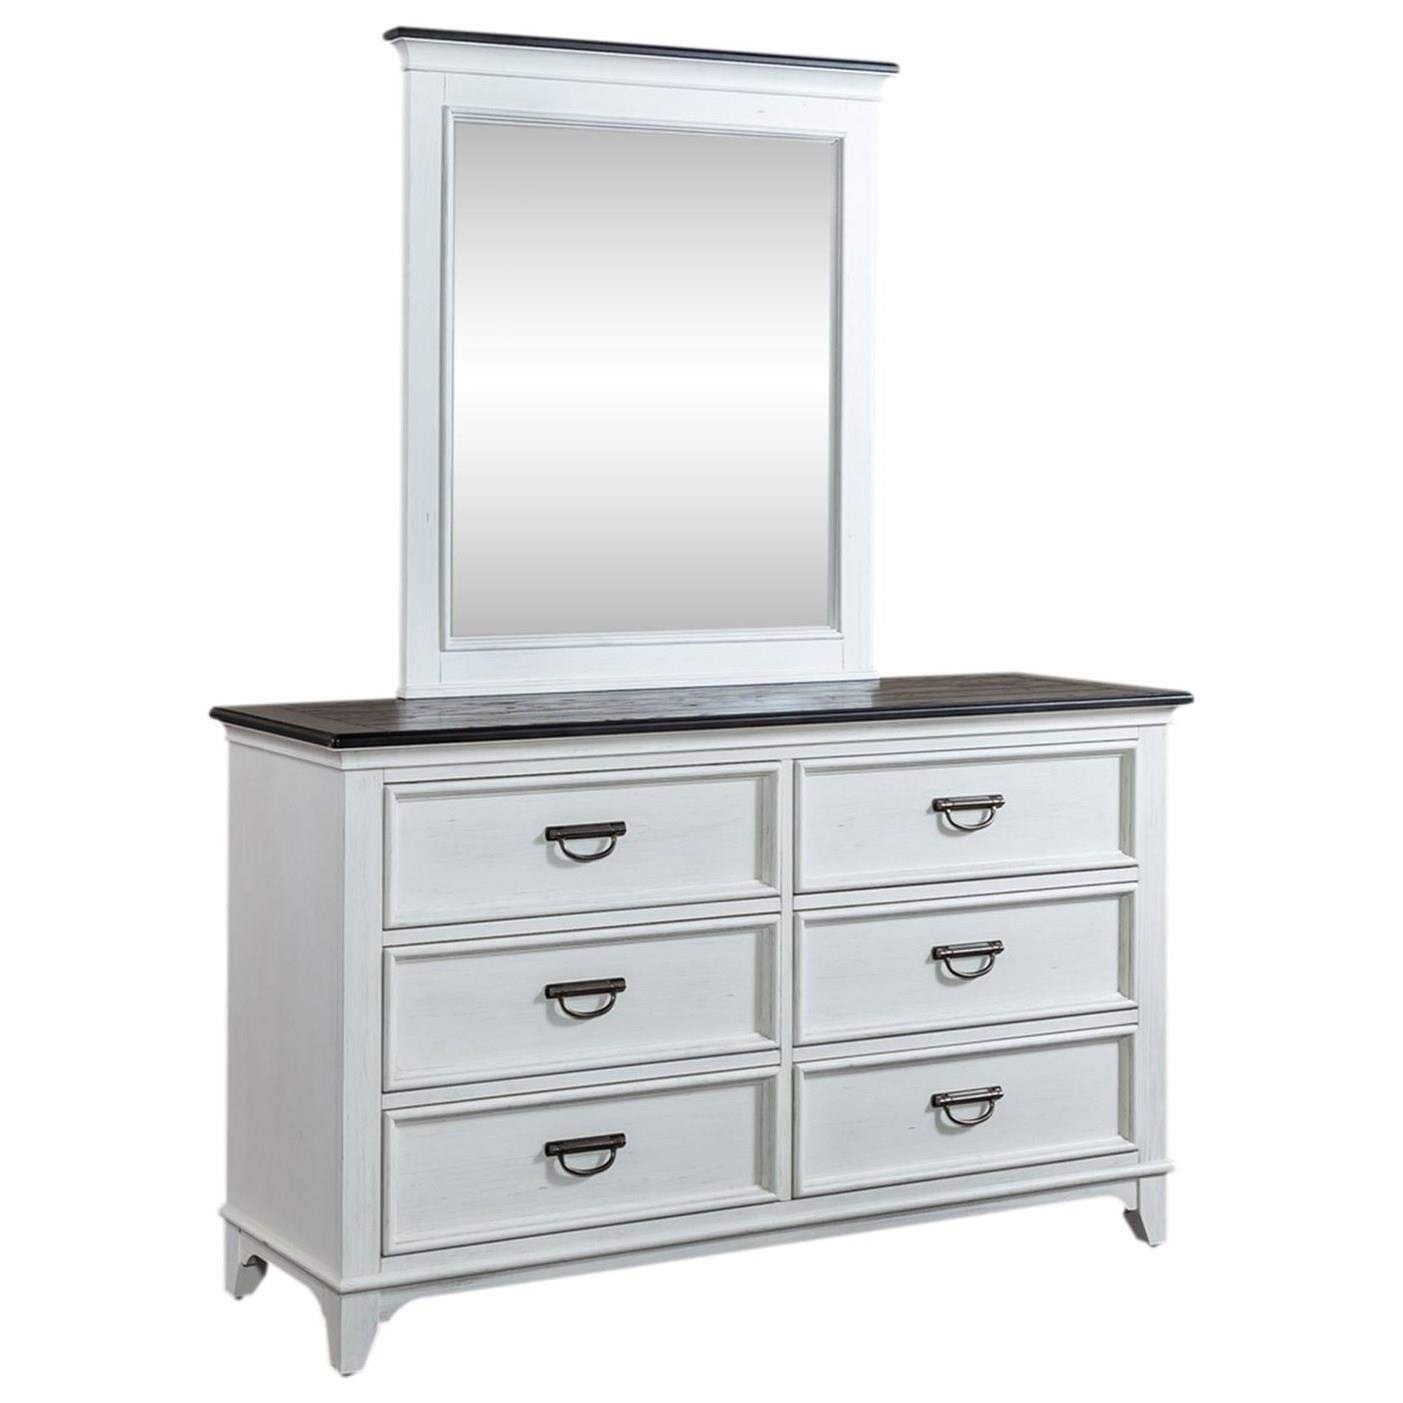 Allyson Park Dresser & Mirror by Liberty Furniture at Van Hill Furniture